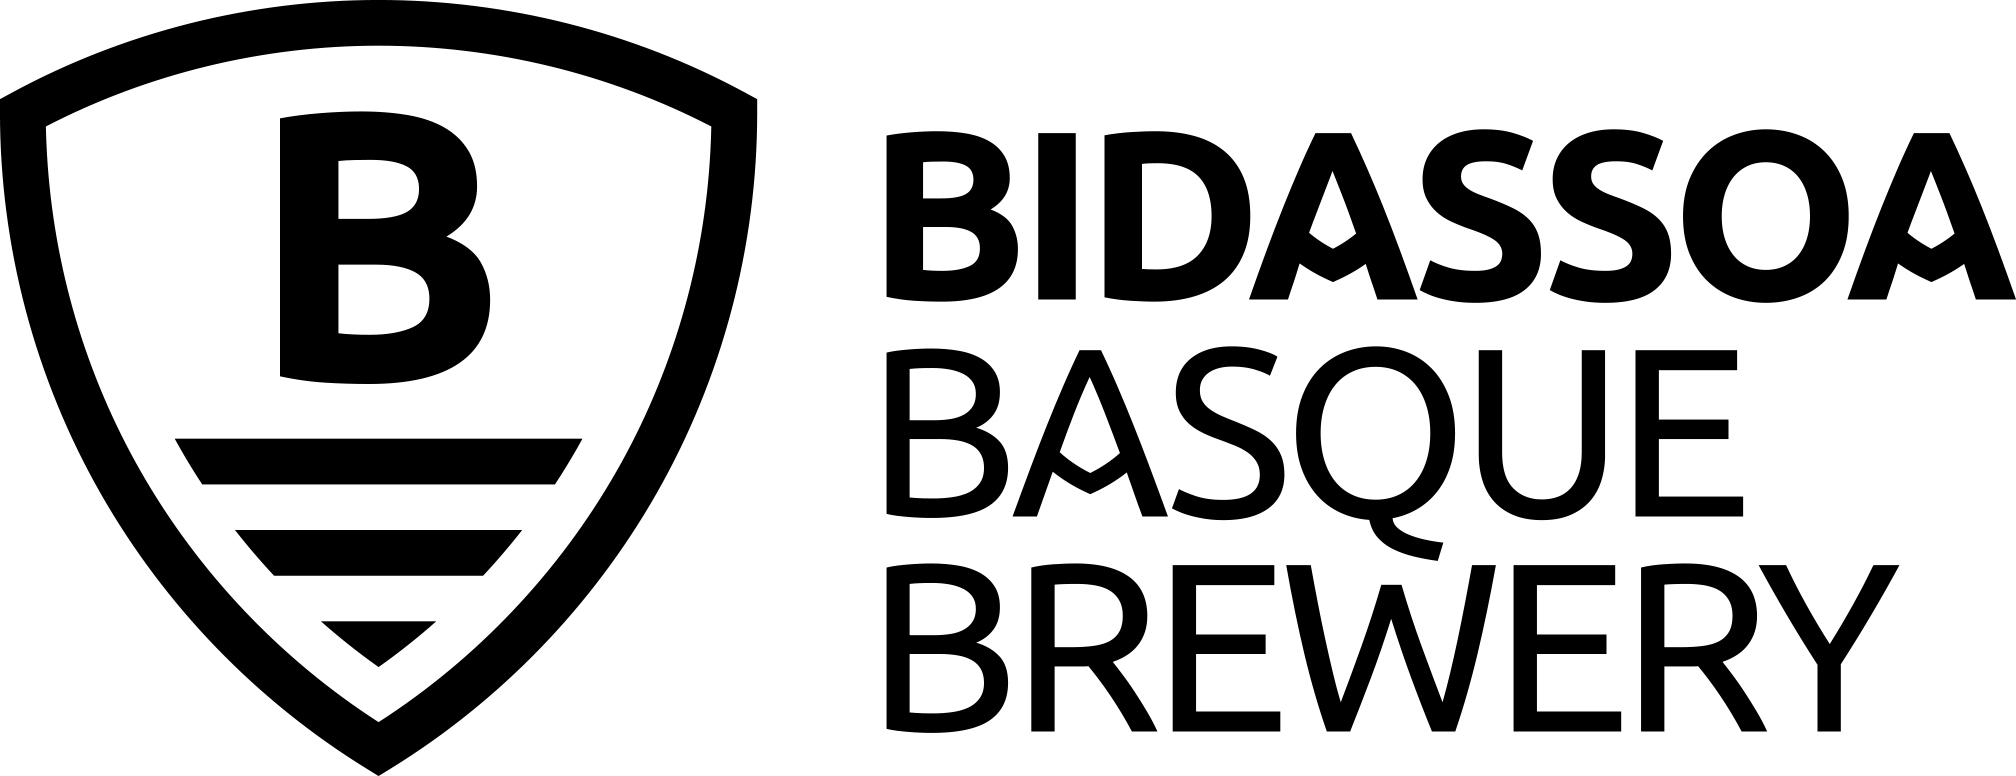 BIDASSOA MARCA_Versiones-1